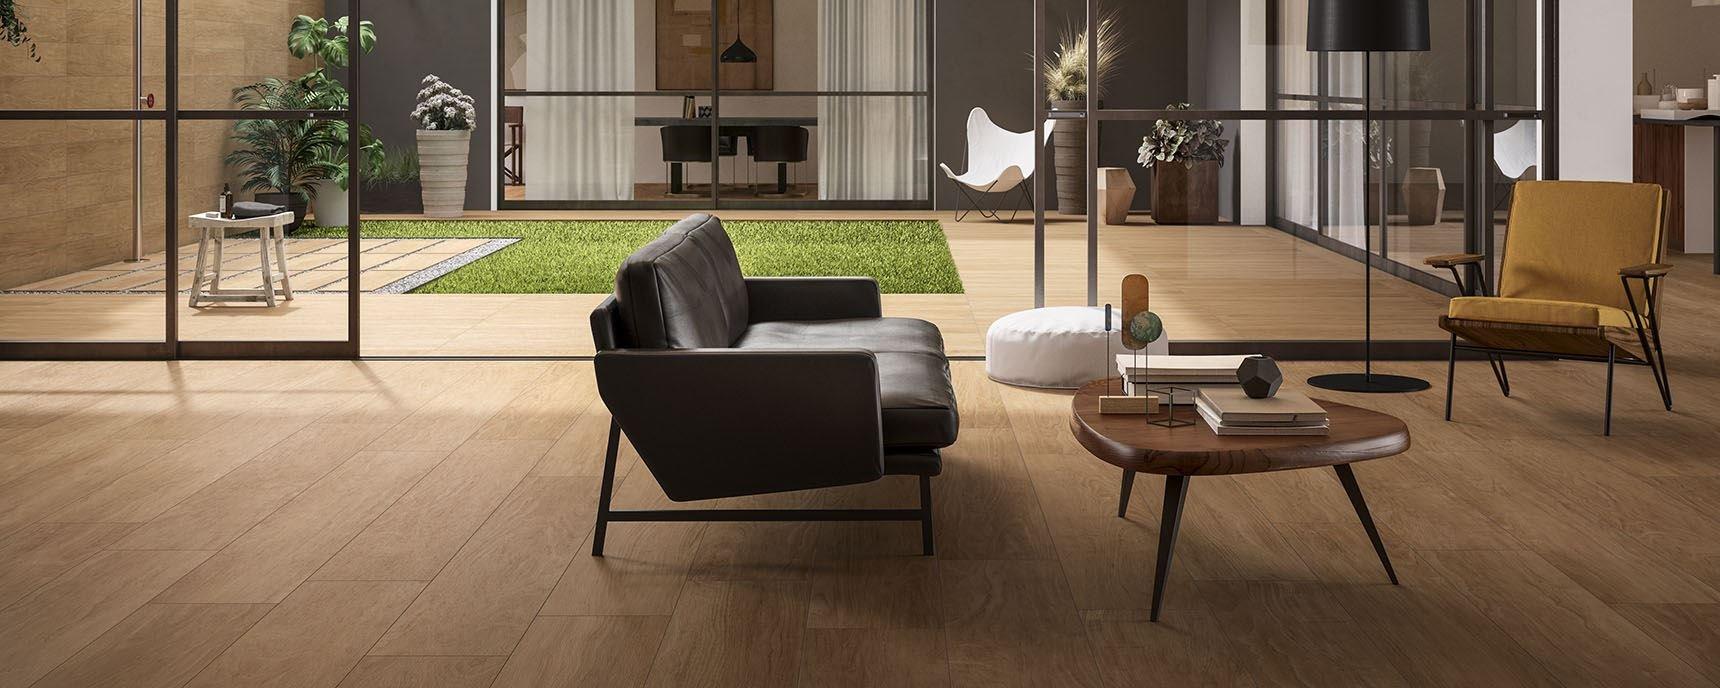 nuovi paesaggi domestici protagonista la natura panaria. Black Bedroom Furniture Sets. Home Design Ideas